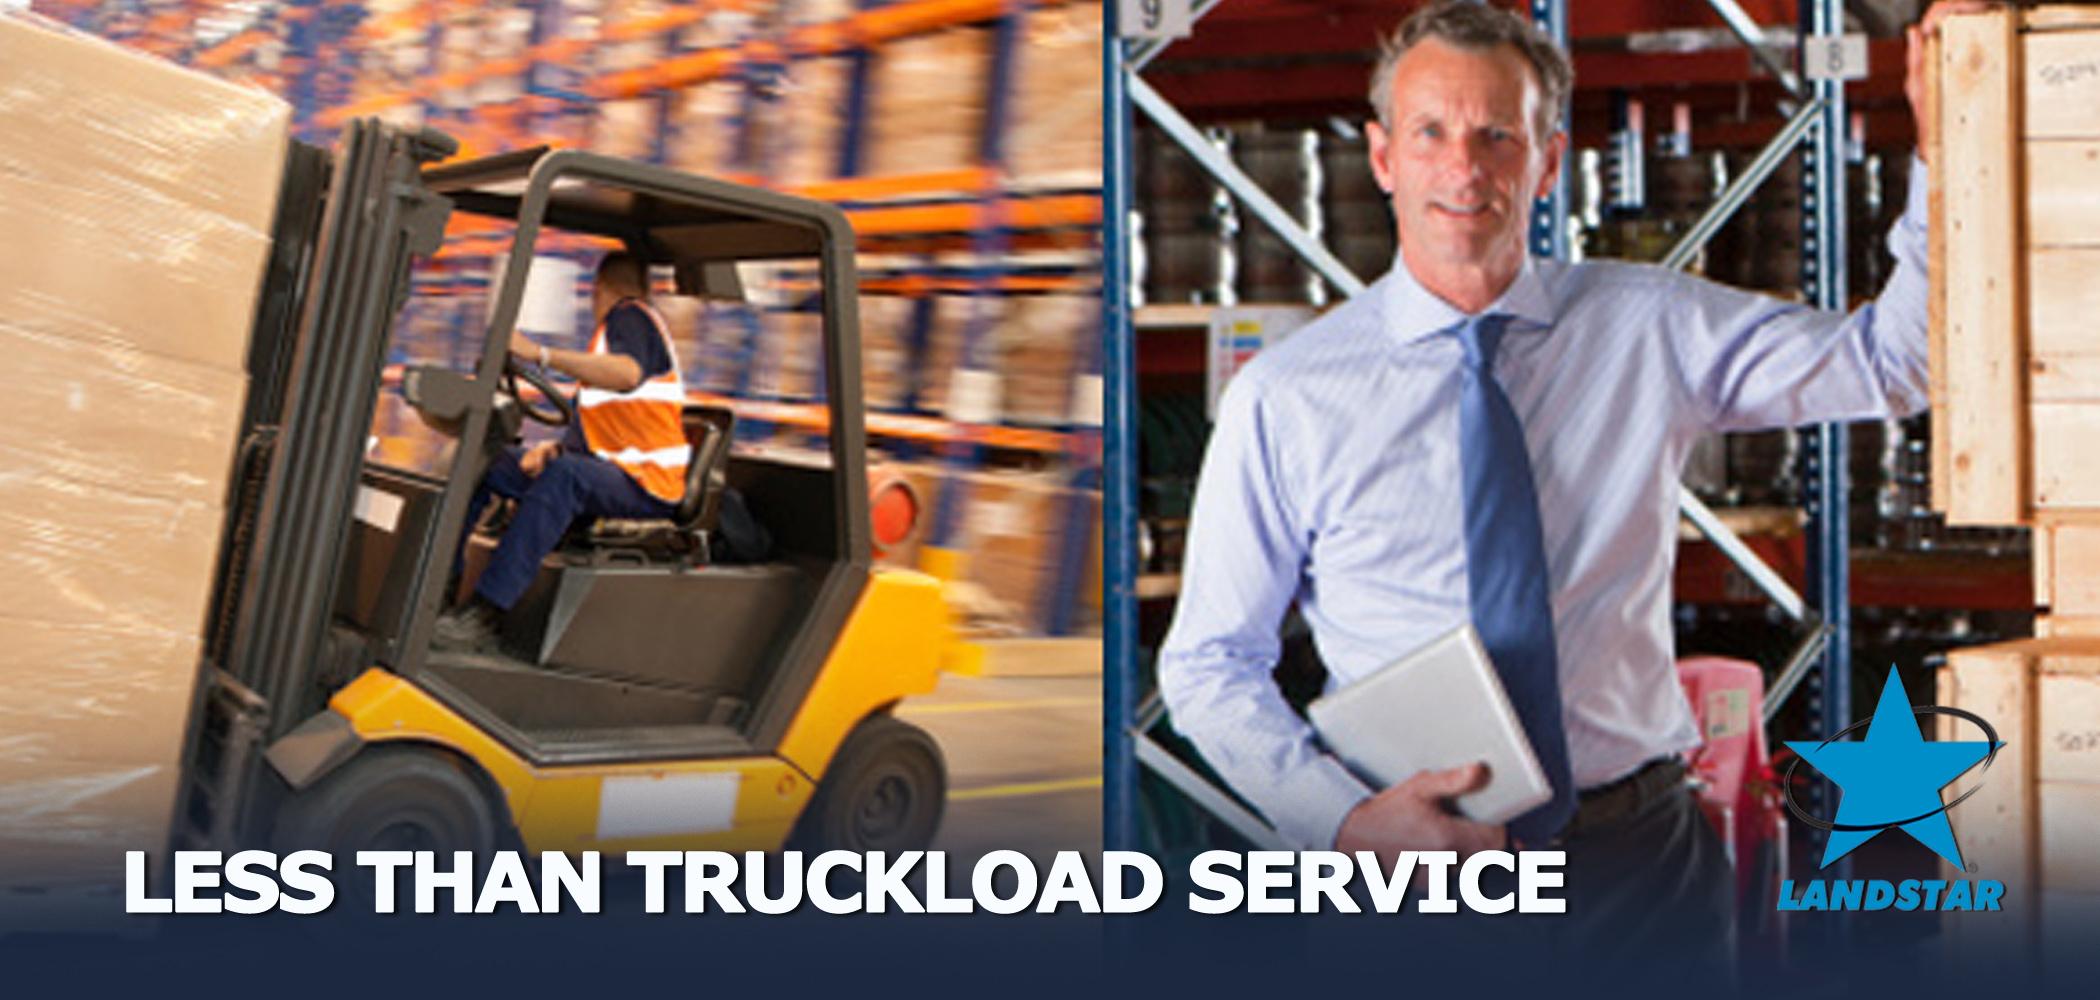 a3-slide-less-than-truckload-service.jpg